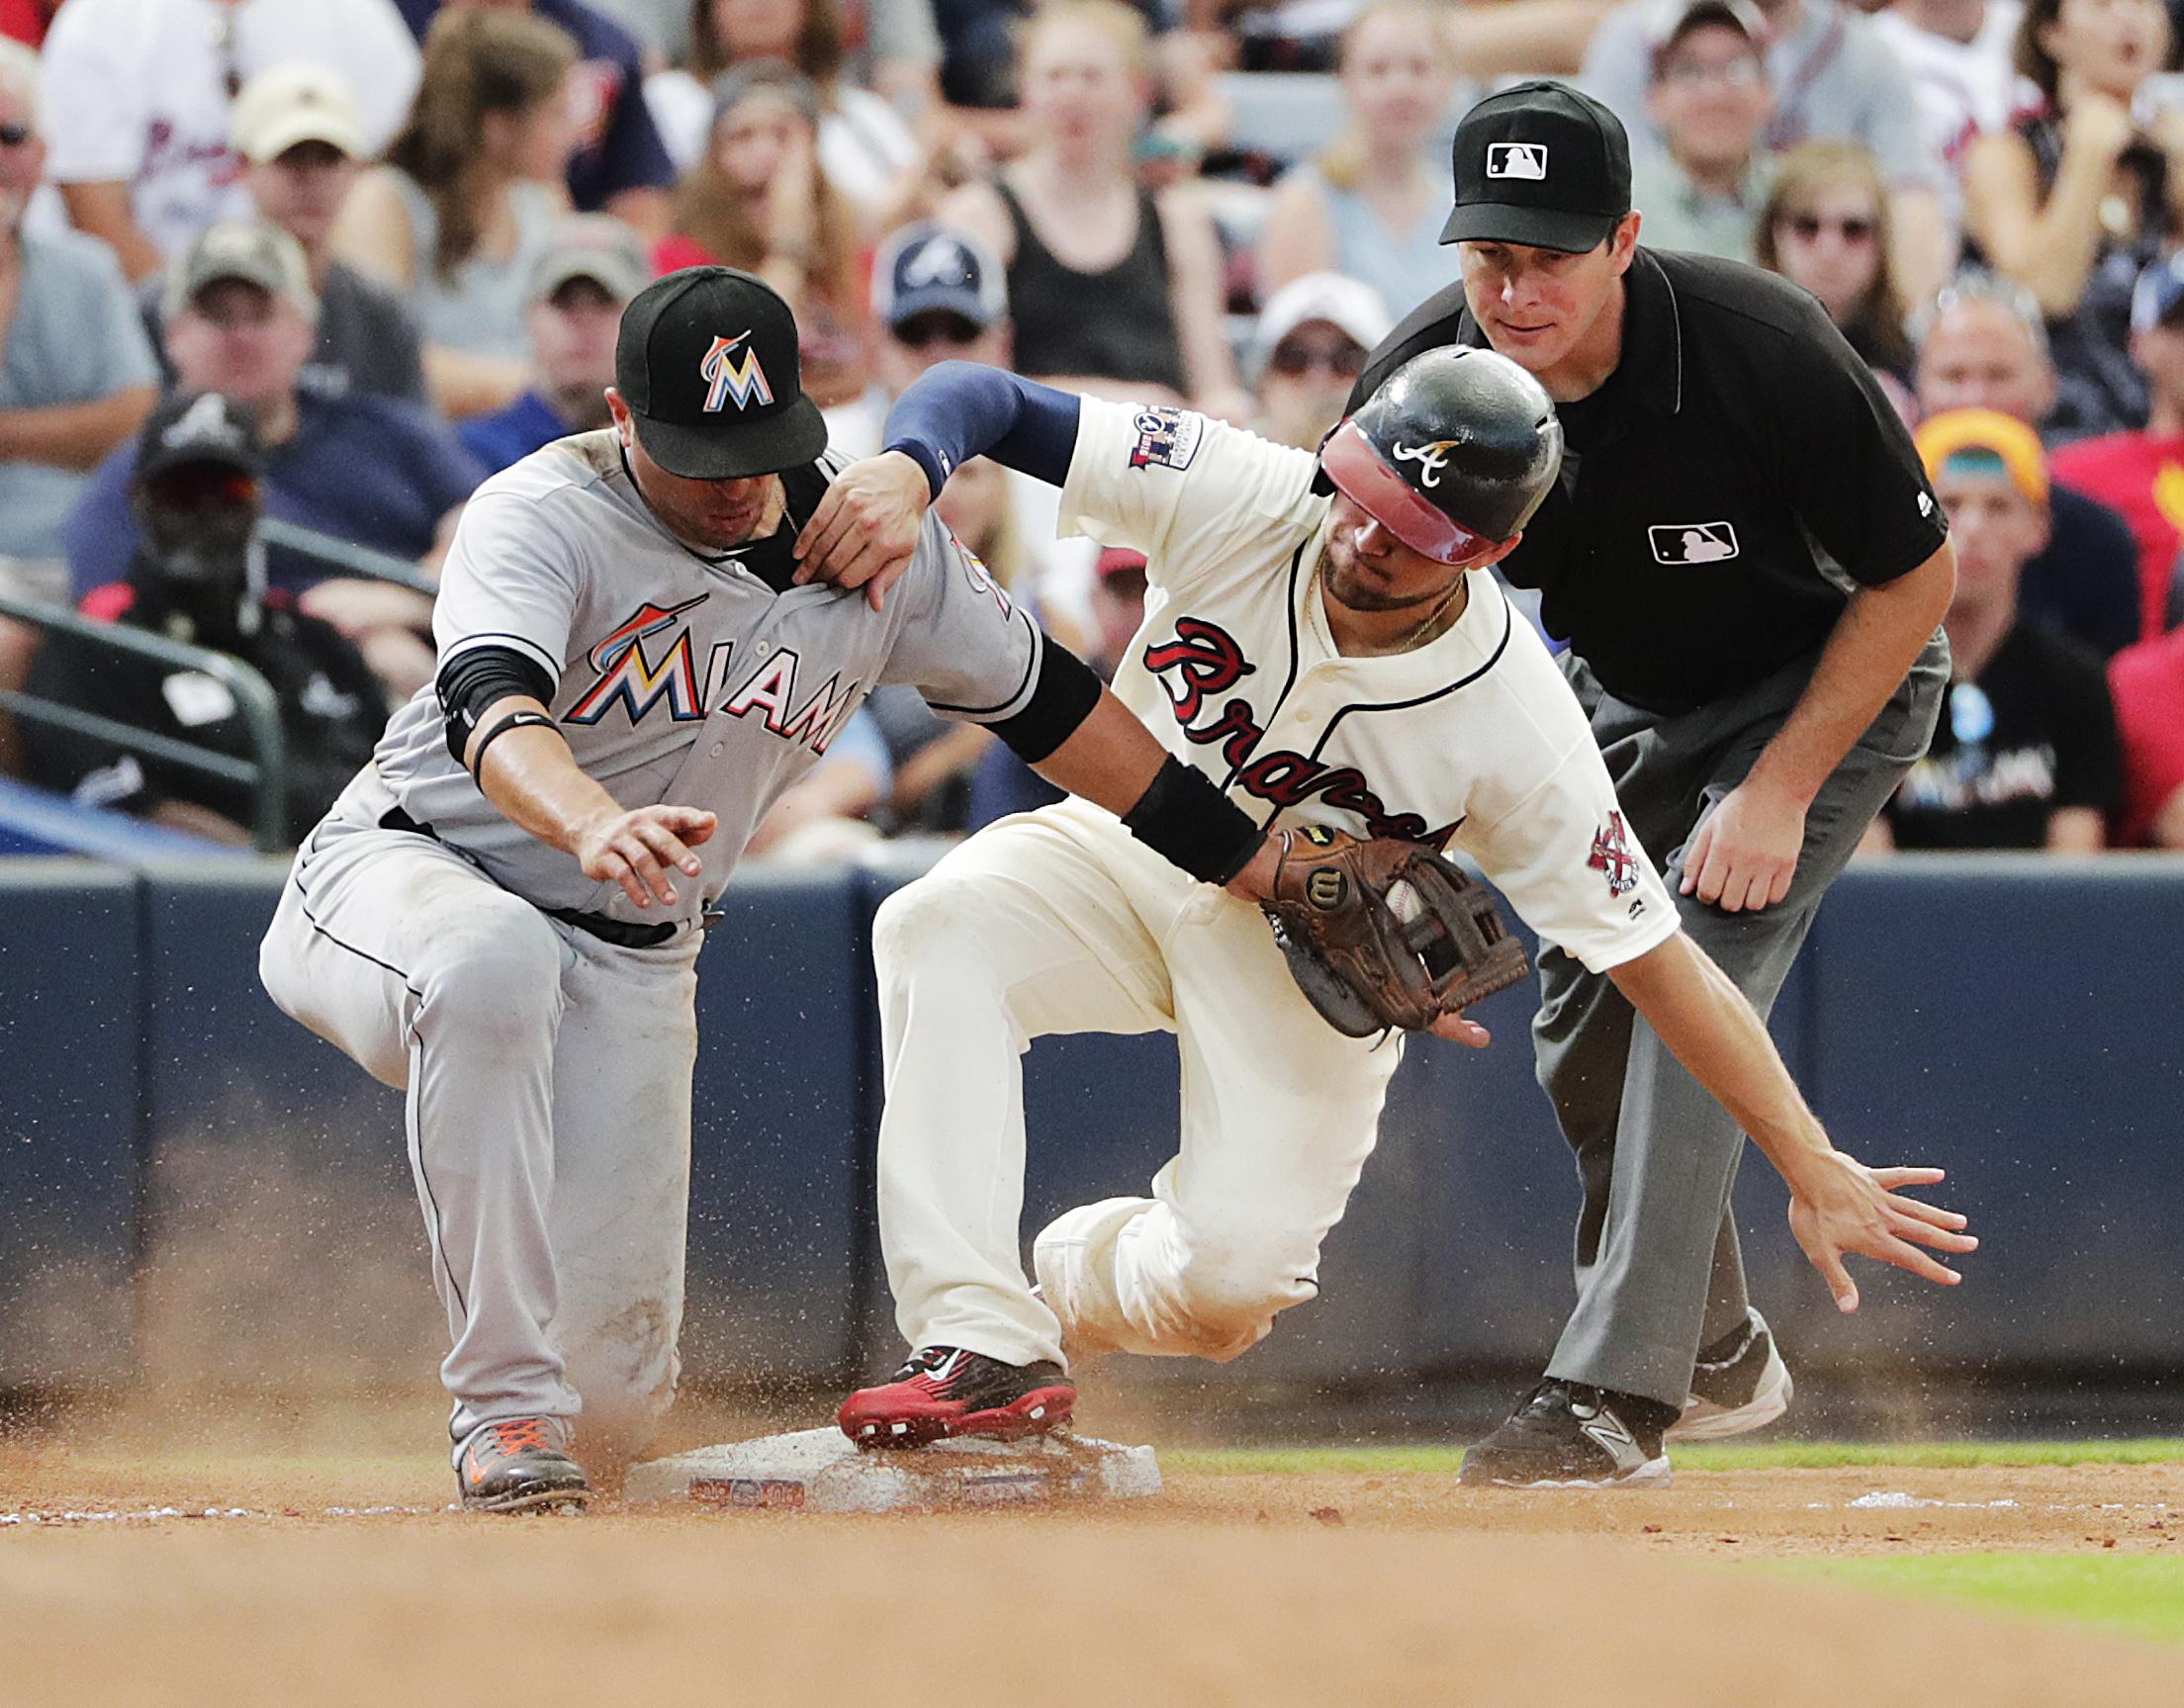 Atlanta Braves' Ender Inciarte, right, beats the tag by Miami Marlins' Martin Prado to steal third base in the eighth inning of a baseball game Sunday, May 29, 2016, in Atlanta. (AP Photo/David Goldman)